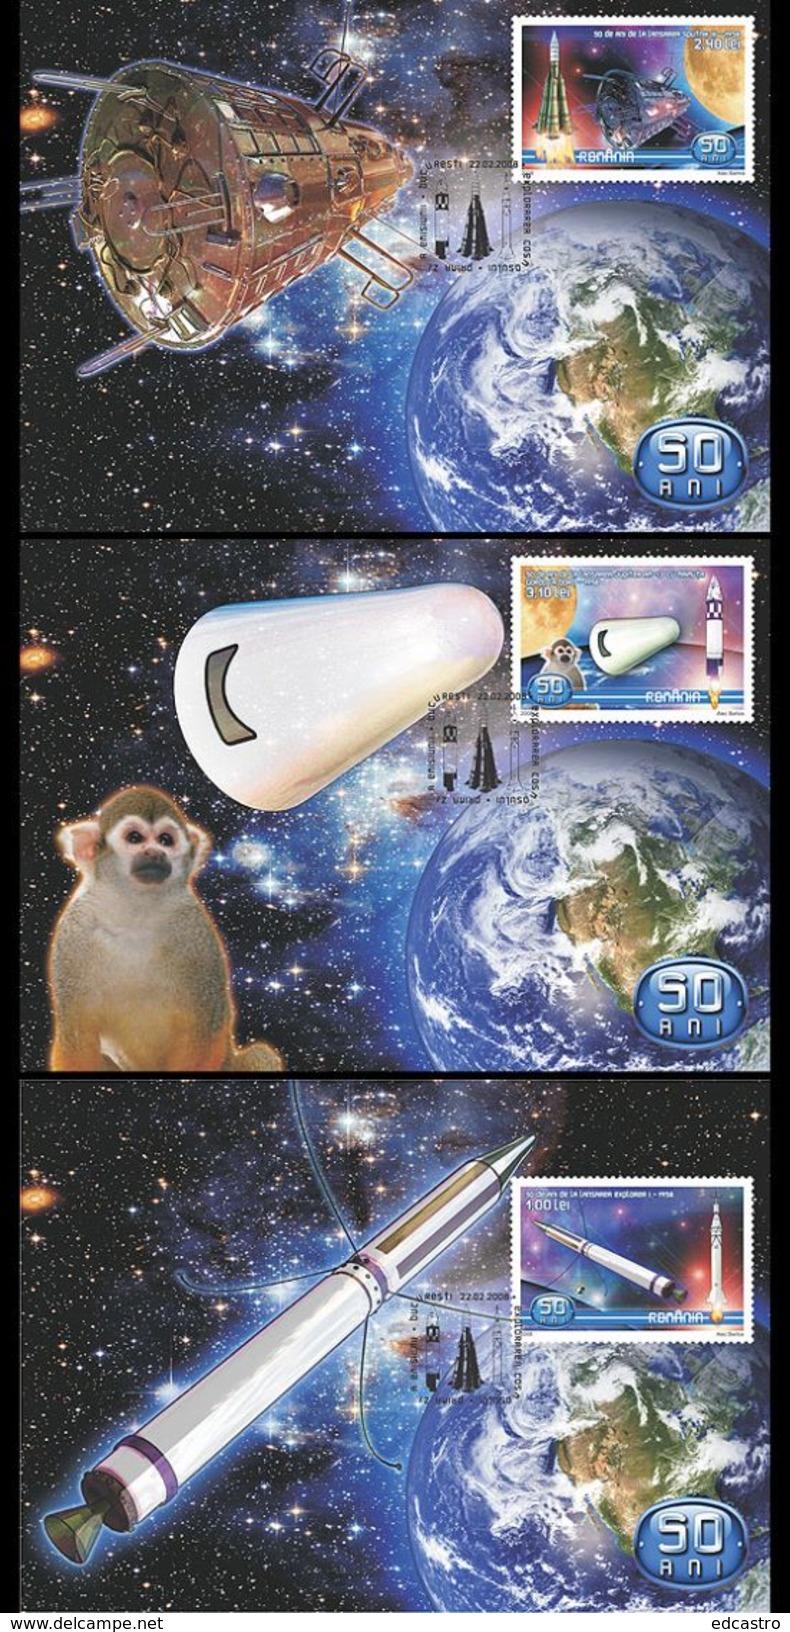 ROMANIA 2008 Three Maximum Cards. Space Exploration - FDC & Commémoratifs